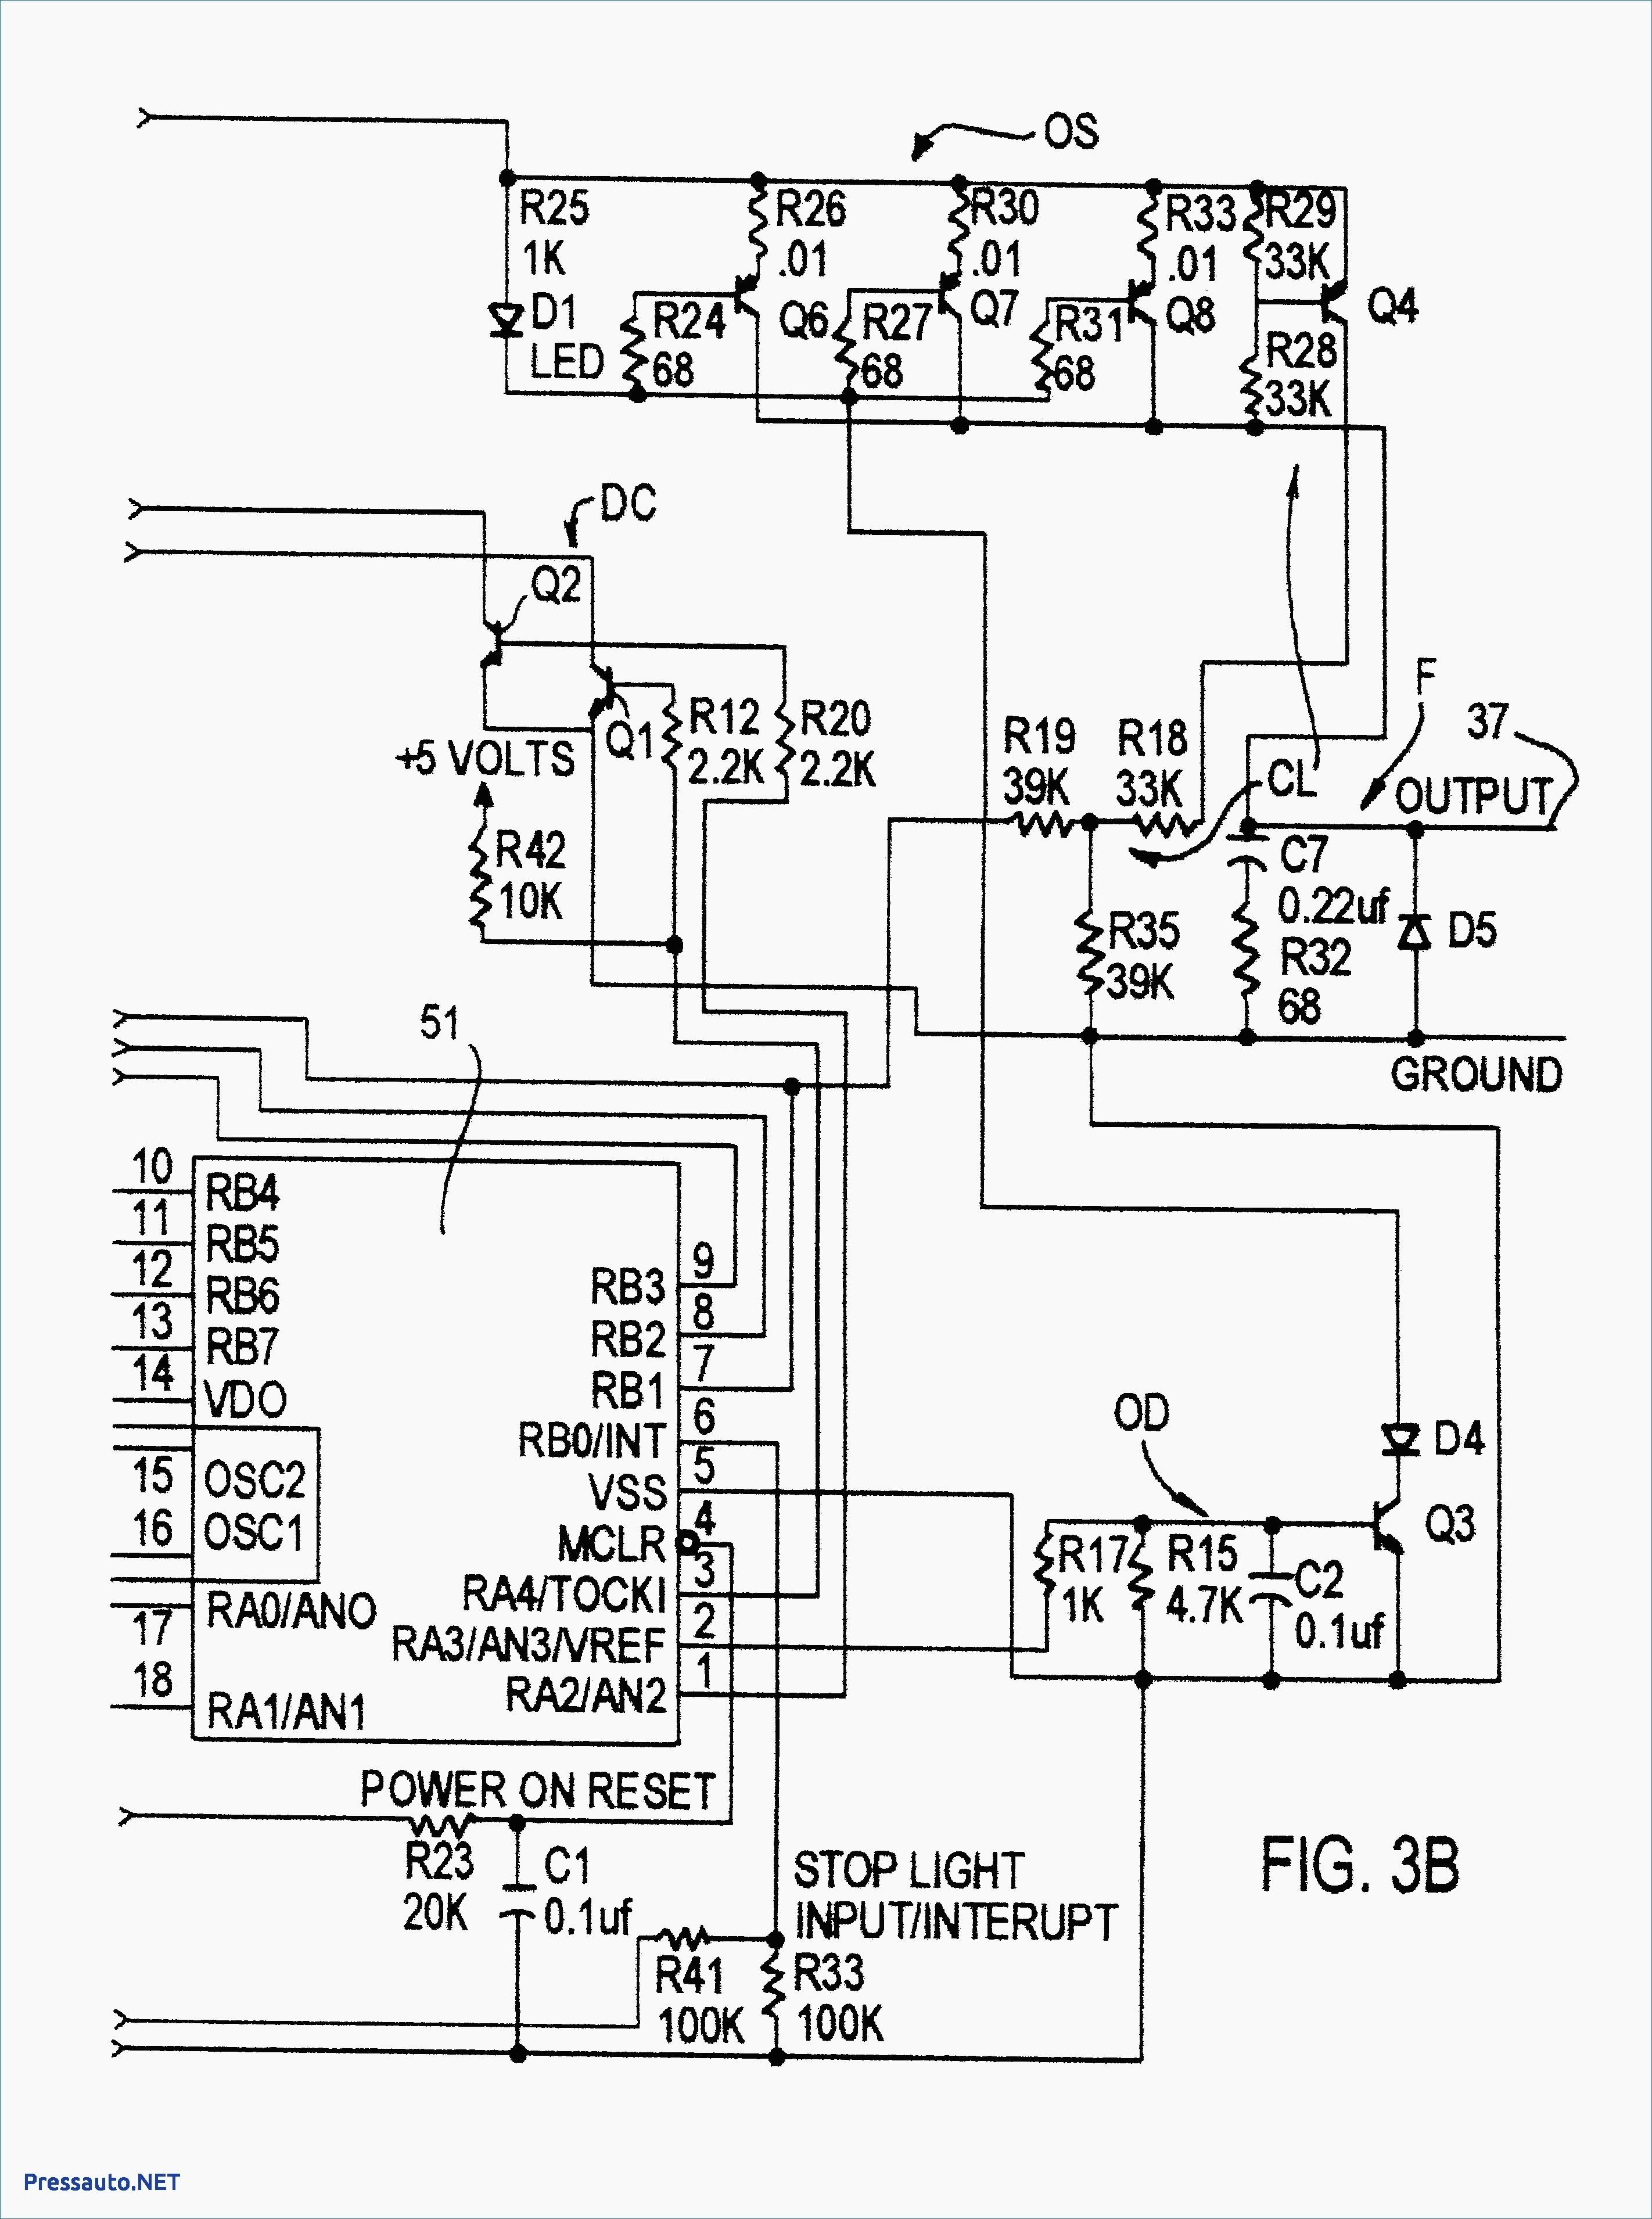 mitsubishi montero wiring diagram free 7 9 artatec automobile de  mitsubishi 6g74 wiring diagram wiring diagram rh 50 nucleusvr nl 2002 mitsubishi montero sports batteries cables